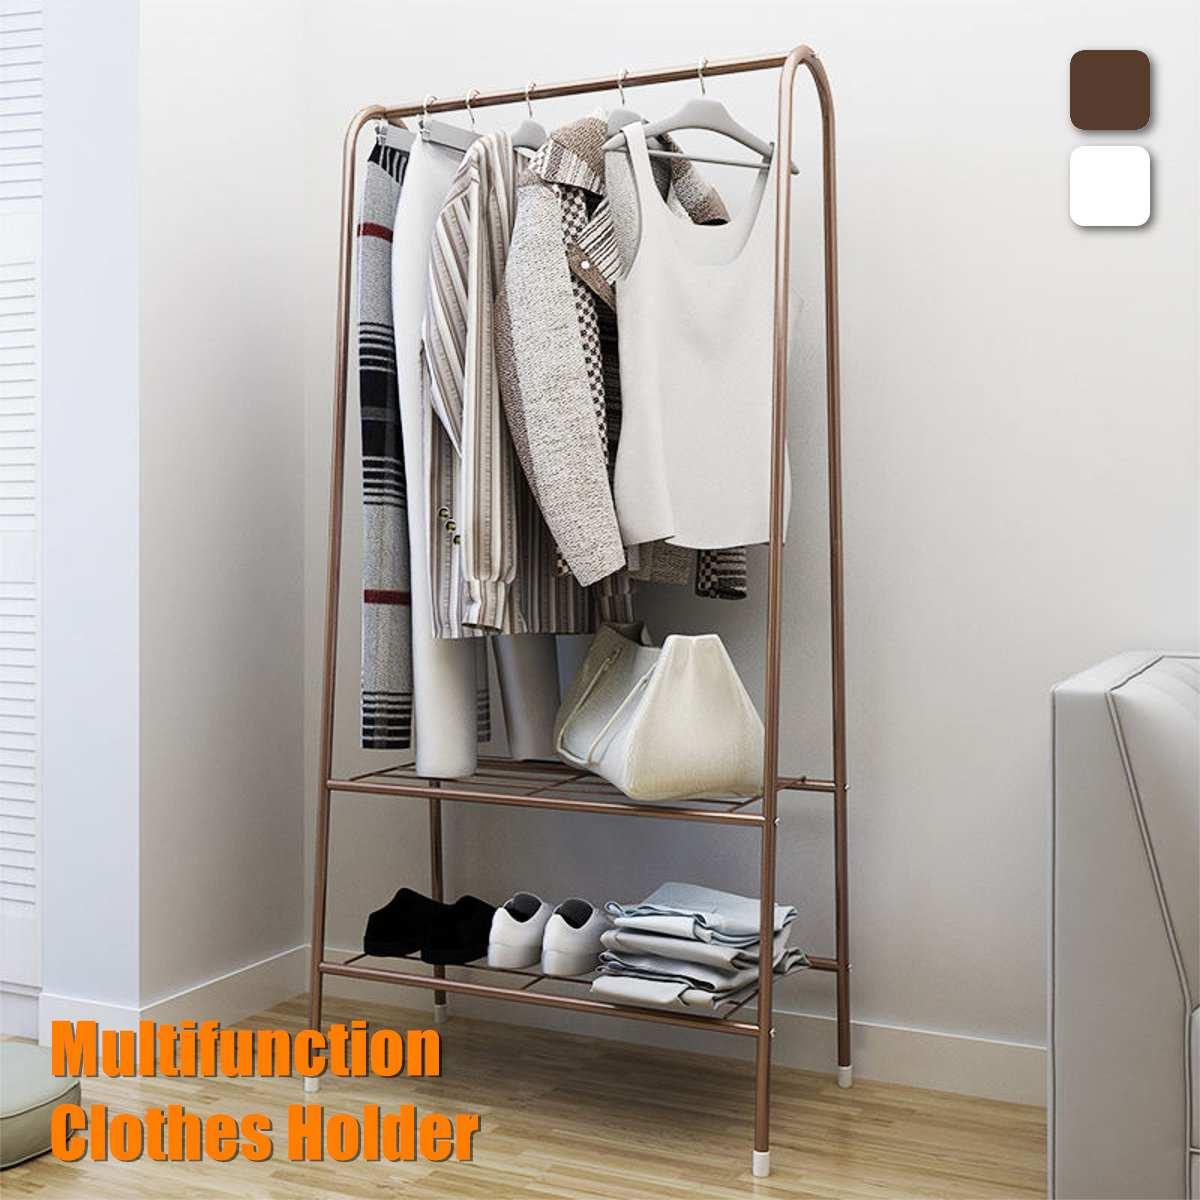 Standing Iron Coat Rack Clothes Holder Storage Rack Garment Display Hanger Living Room Home Furniture 2 Colors Organizer Shelf